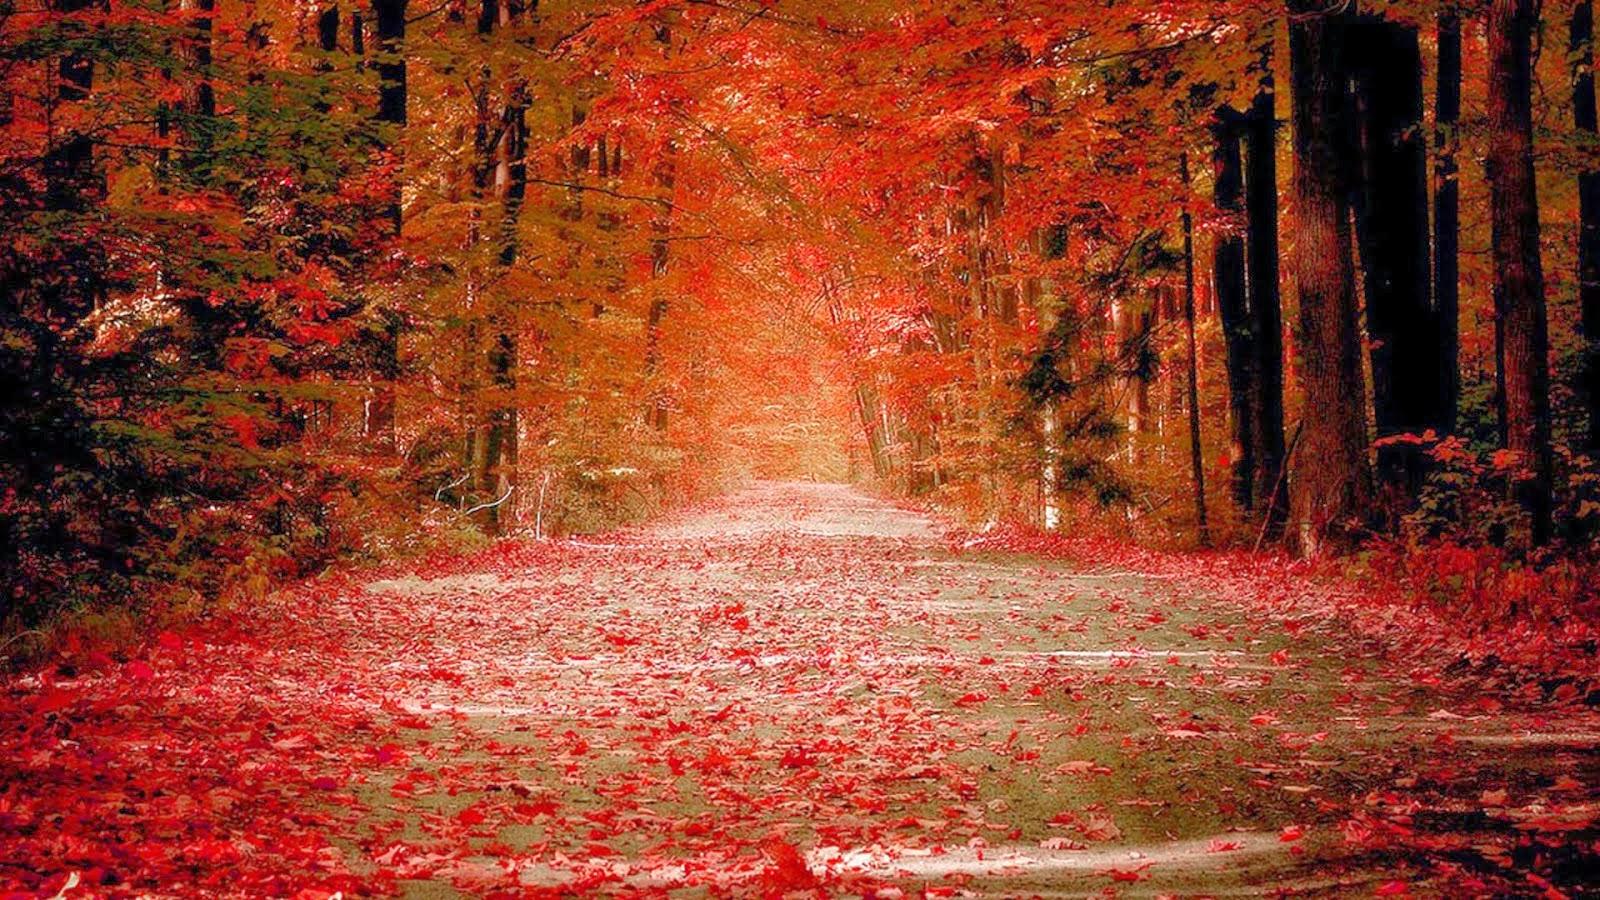 autumn nature hd wallpaper 1080p autumn nature hd wallpaper 1080p 1600x900